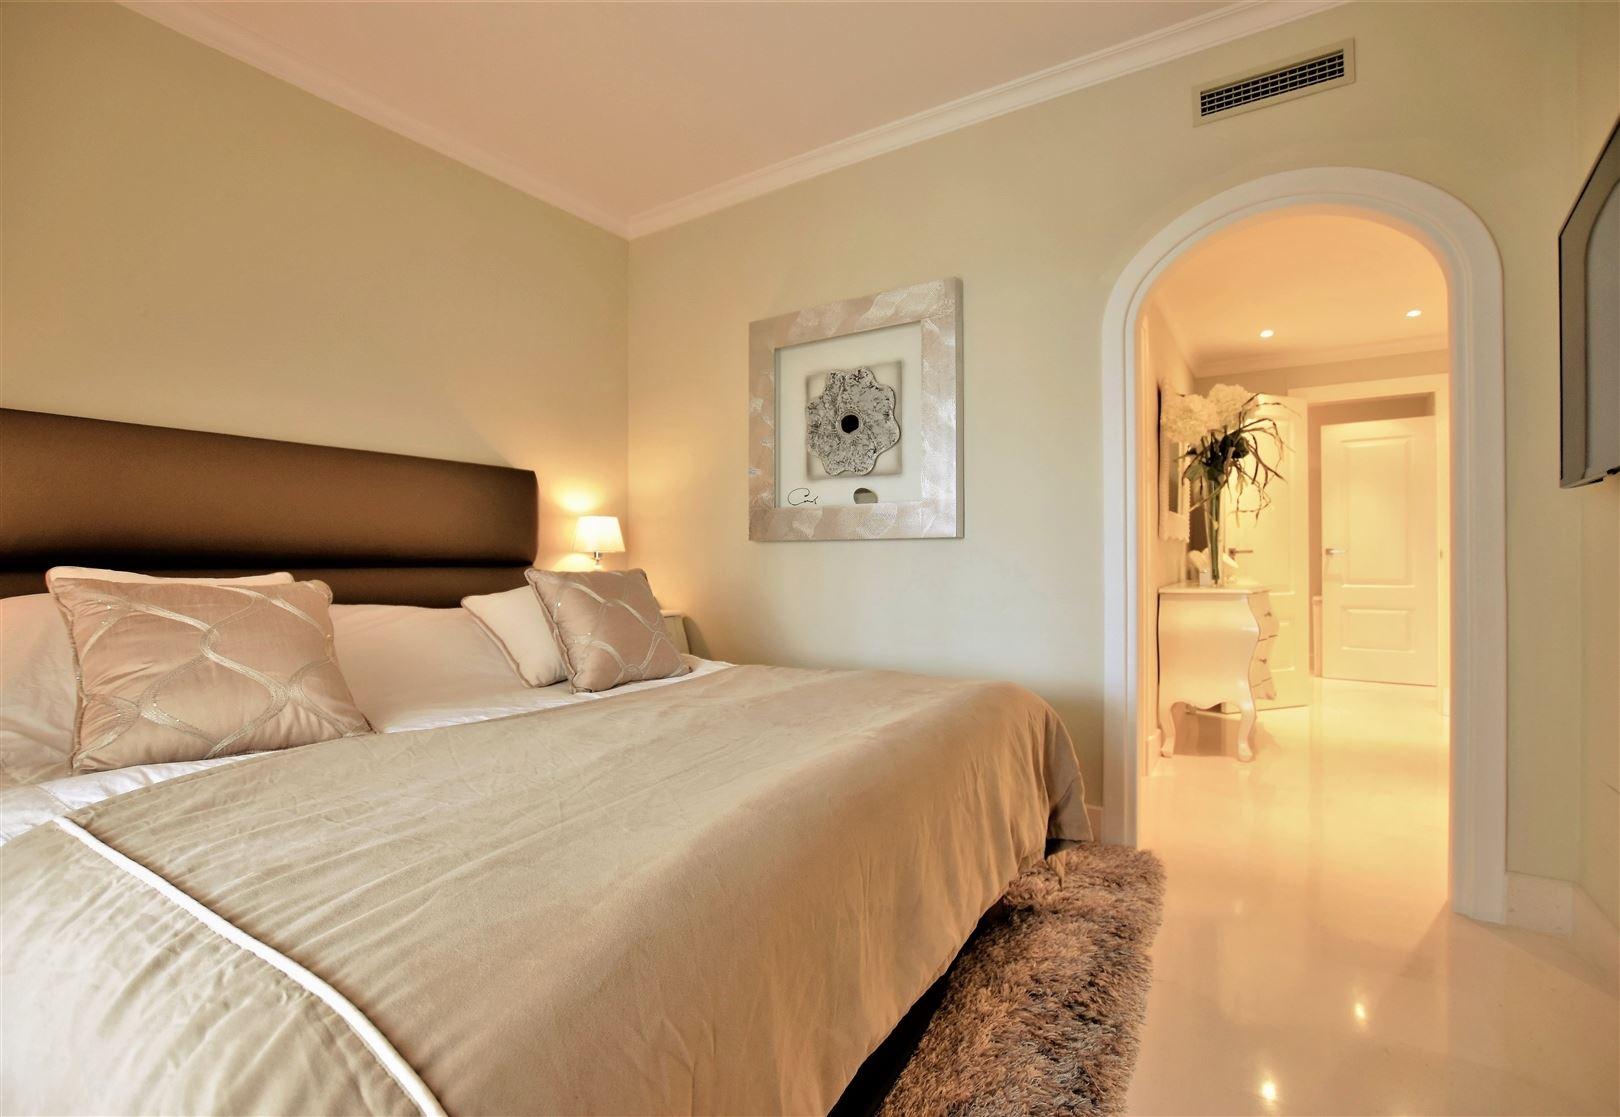 Foto 19 : Appartement te 29679 MARBELLA (Spanje) - Prijs € 1.750